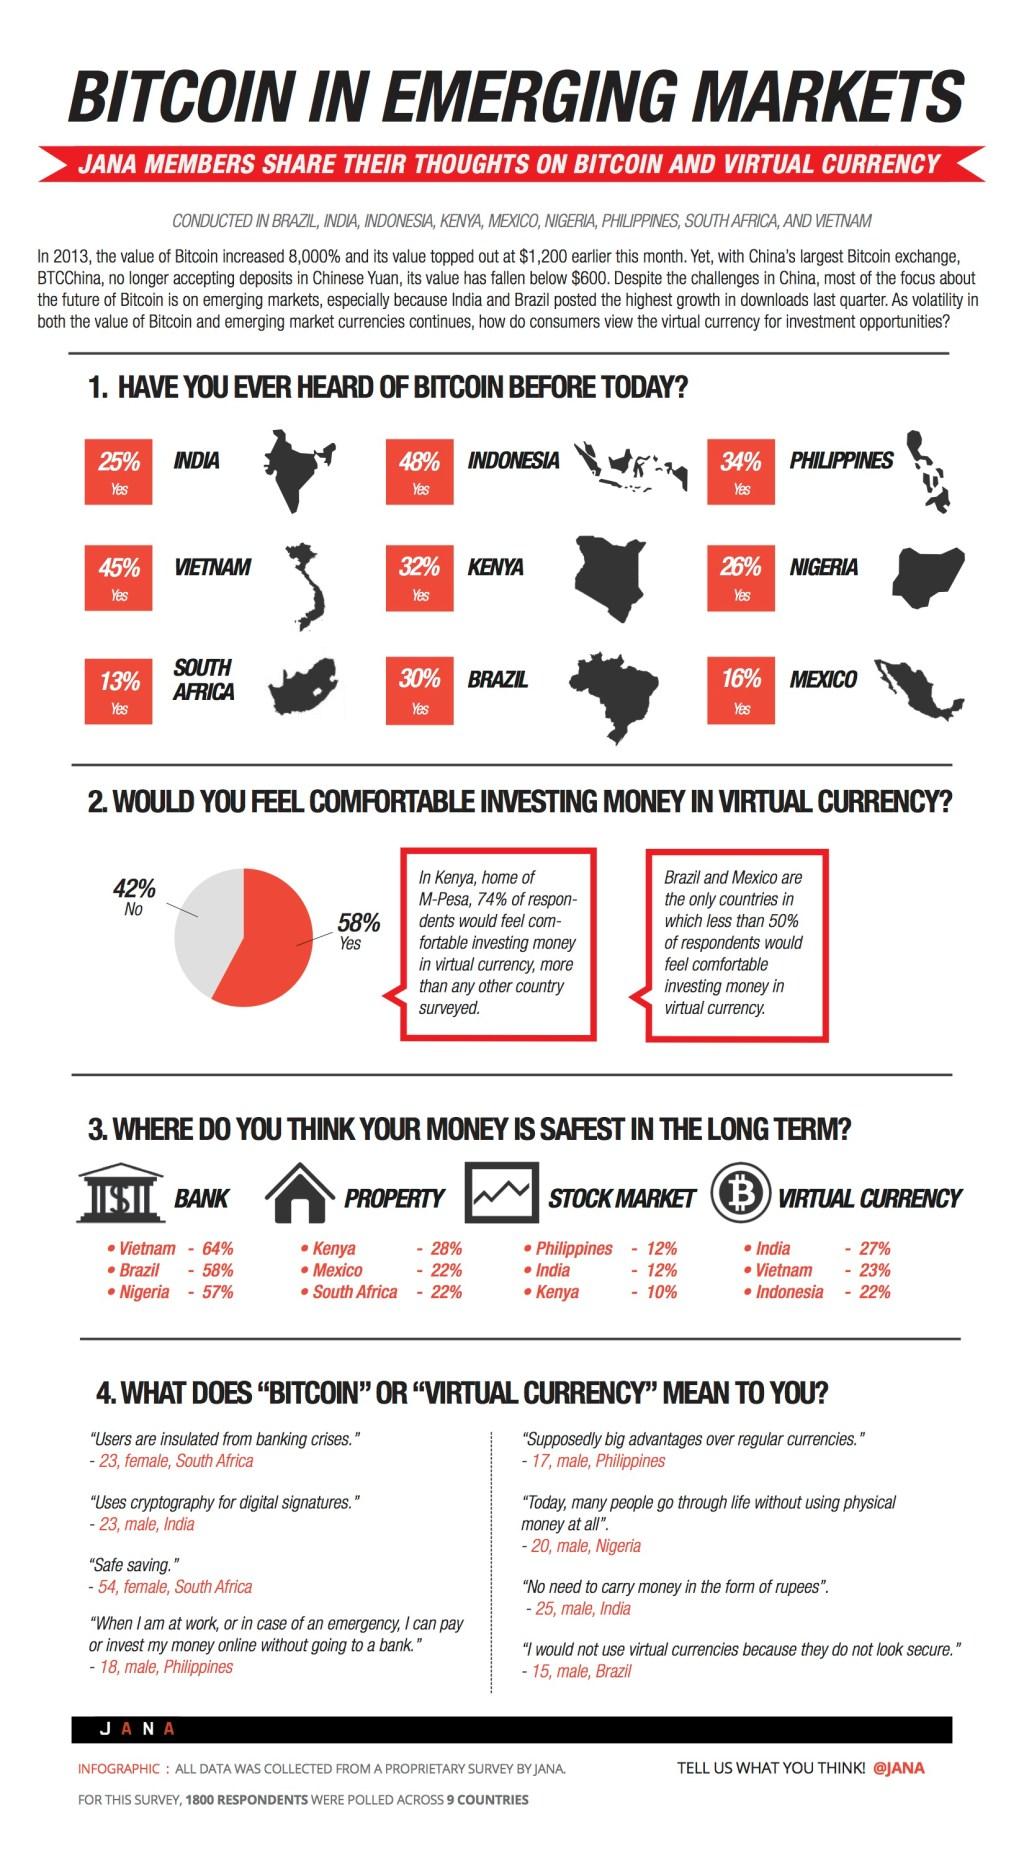 Jana_Bitcoin Infographic